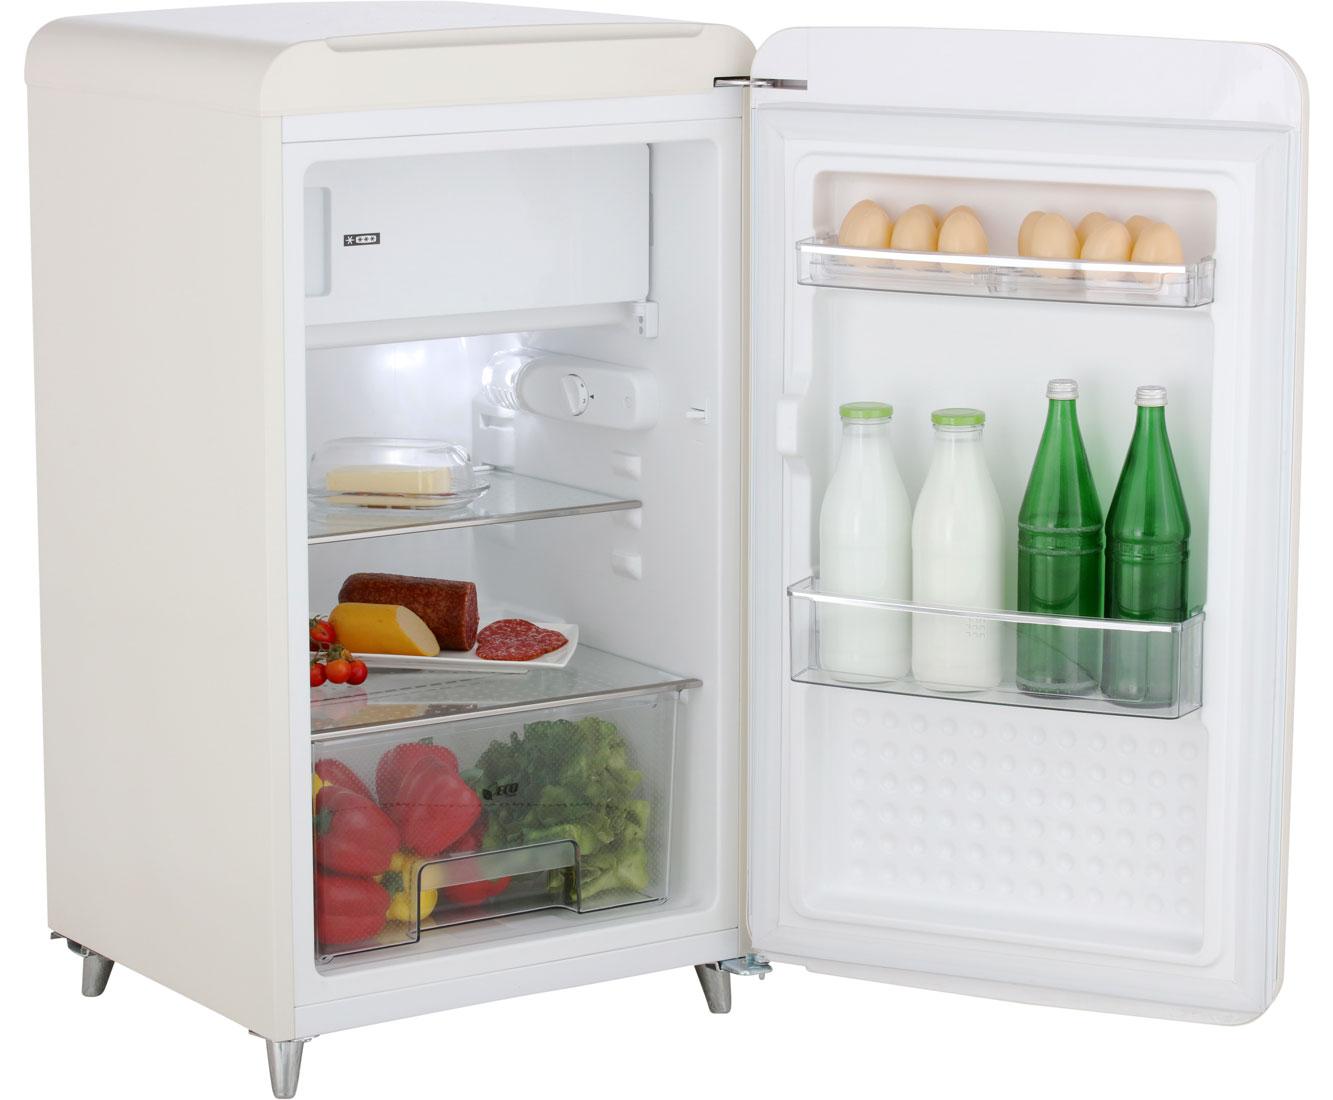 Bomann Kühlschrank Kühlt Zu Stark : Kühlschrank welche stufe kühlschrank oldschool jennifer h juarez blog